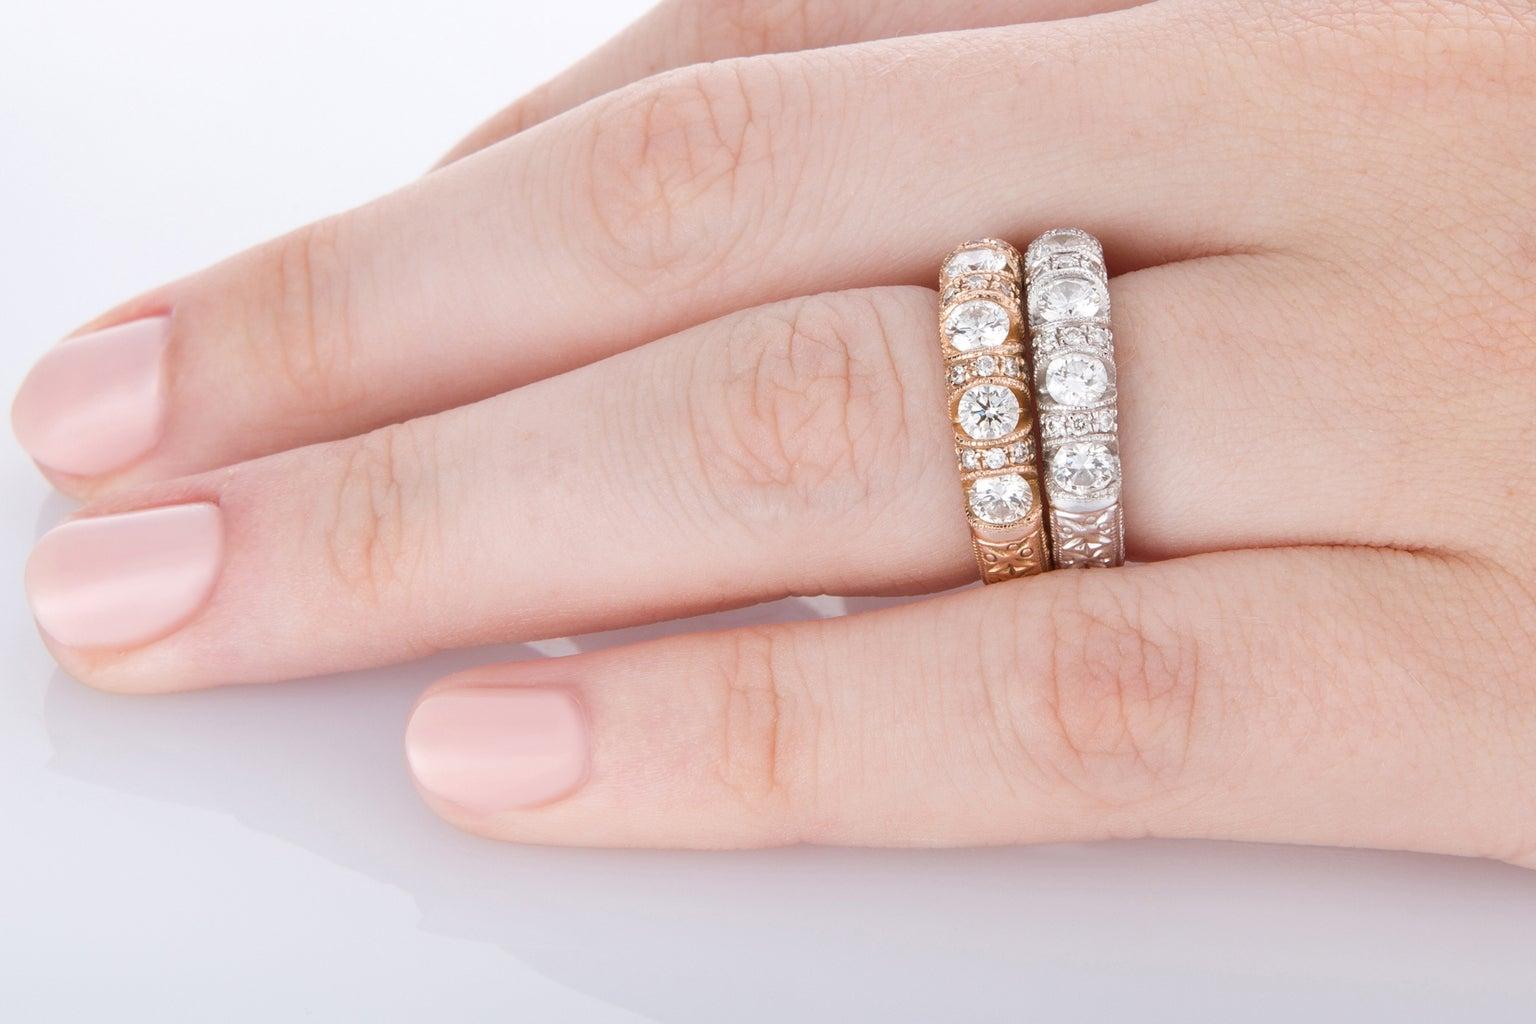 18 Karat Rose Gold Engraved Eternity Ring For Sale at 1stdibs